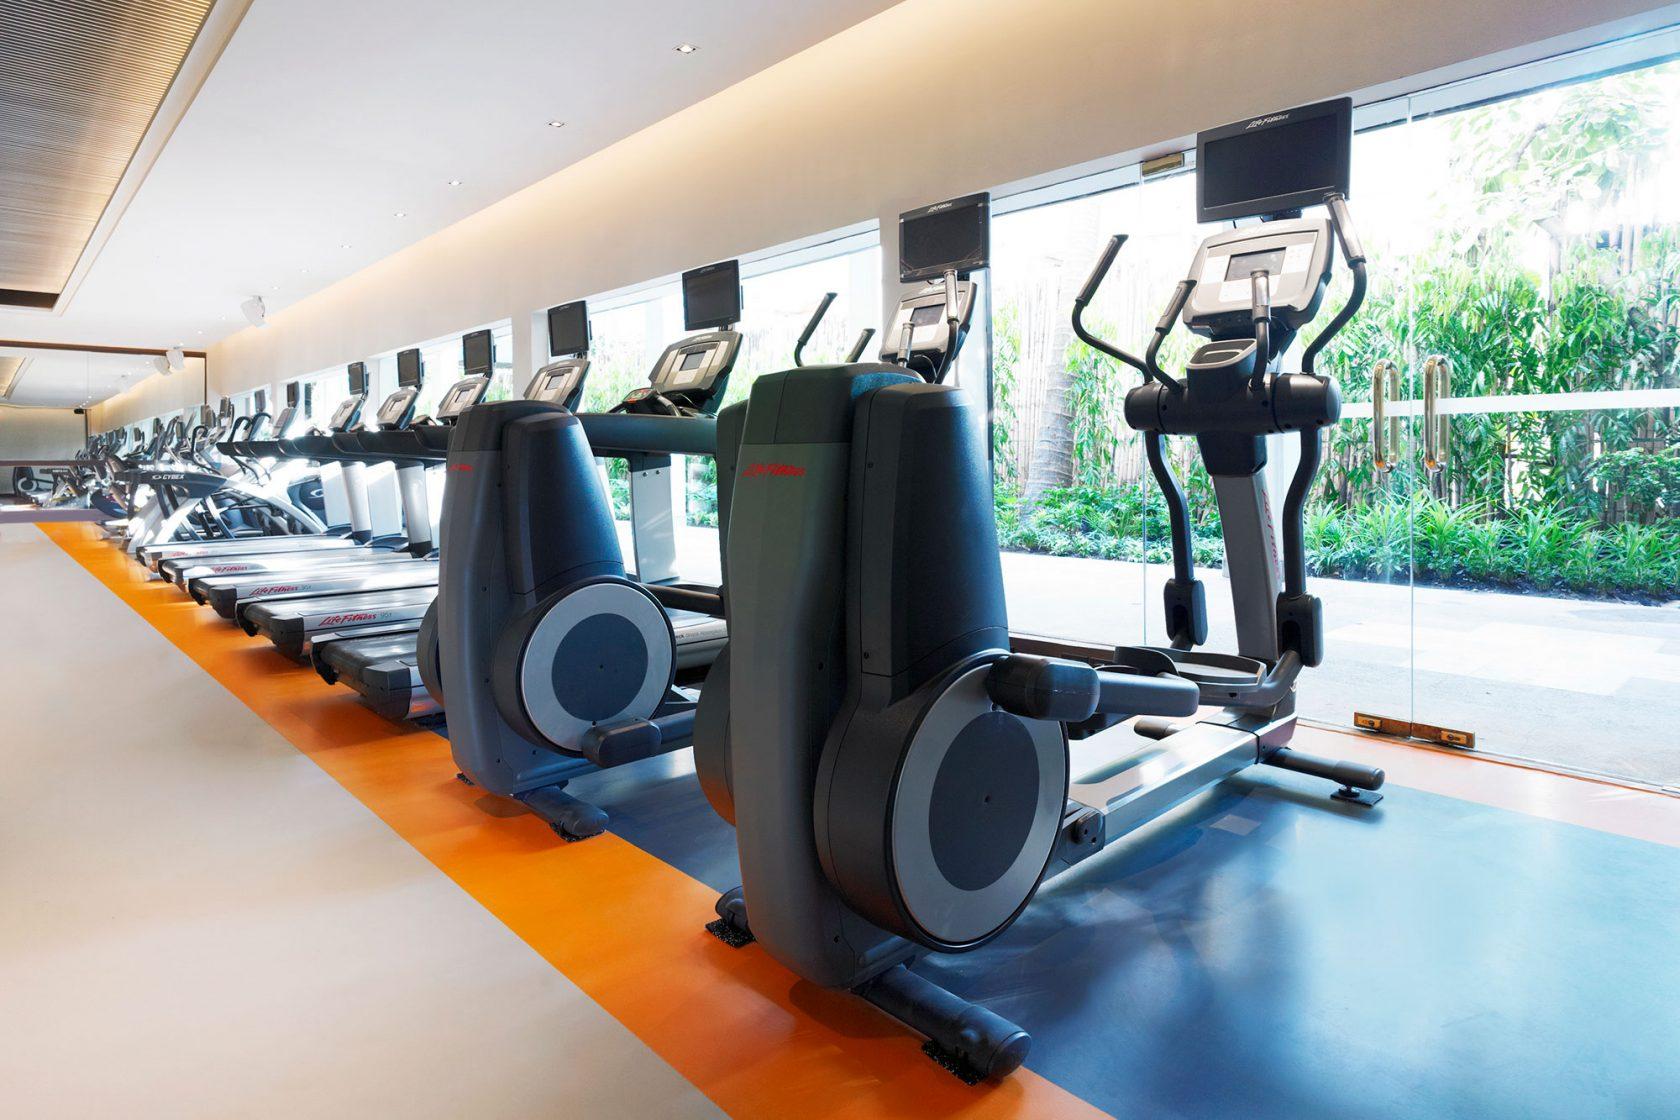 Anantara Riverside Bangkok Fitness Club